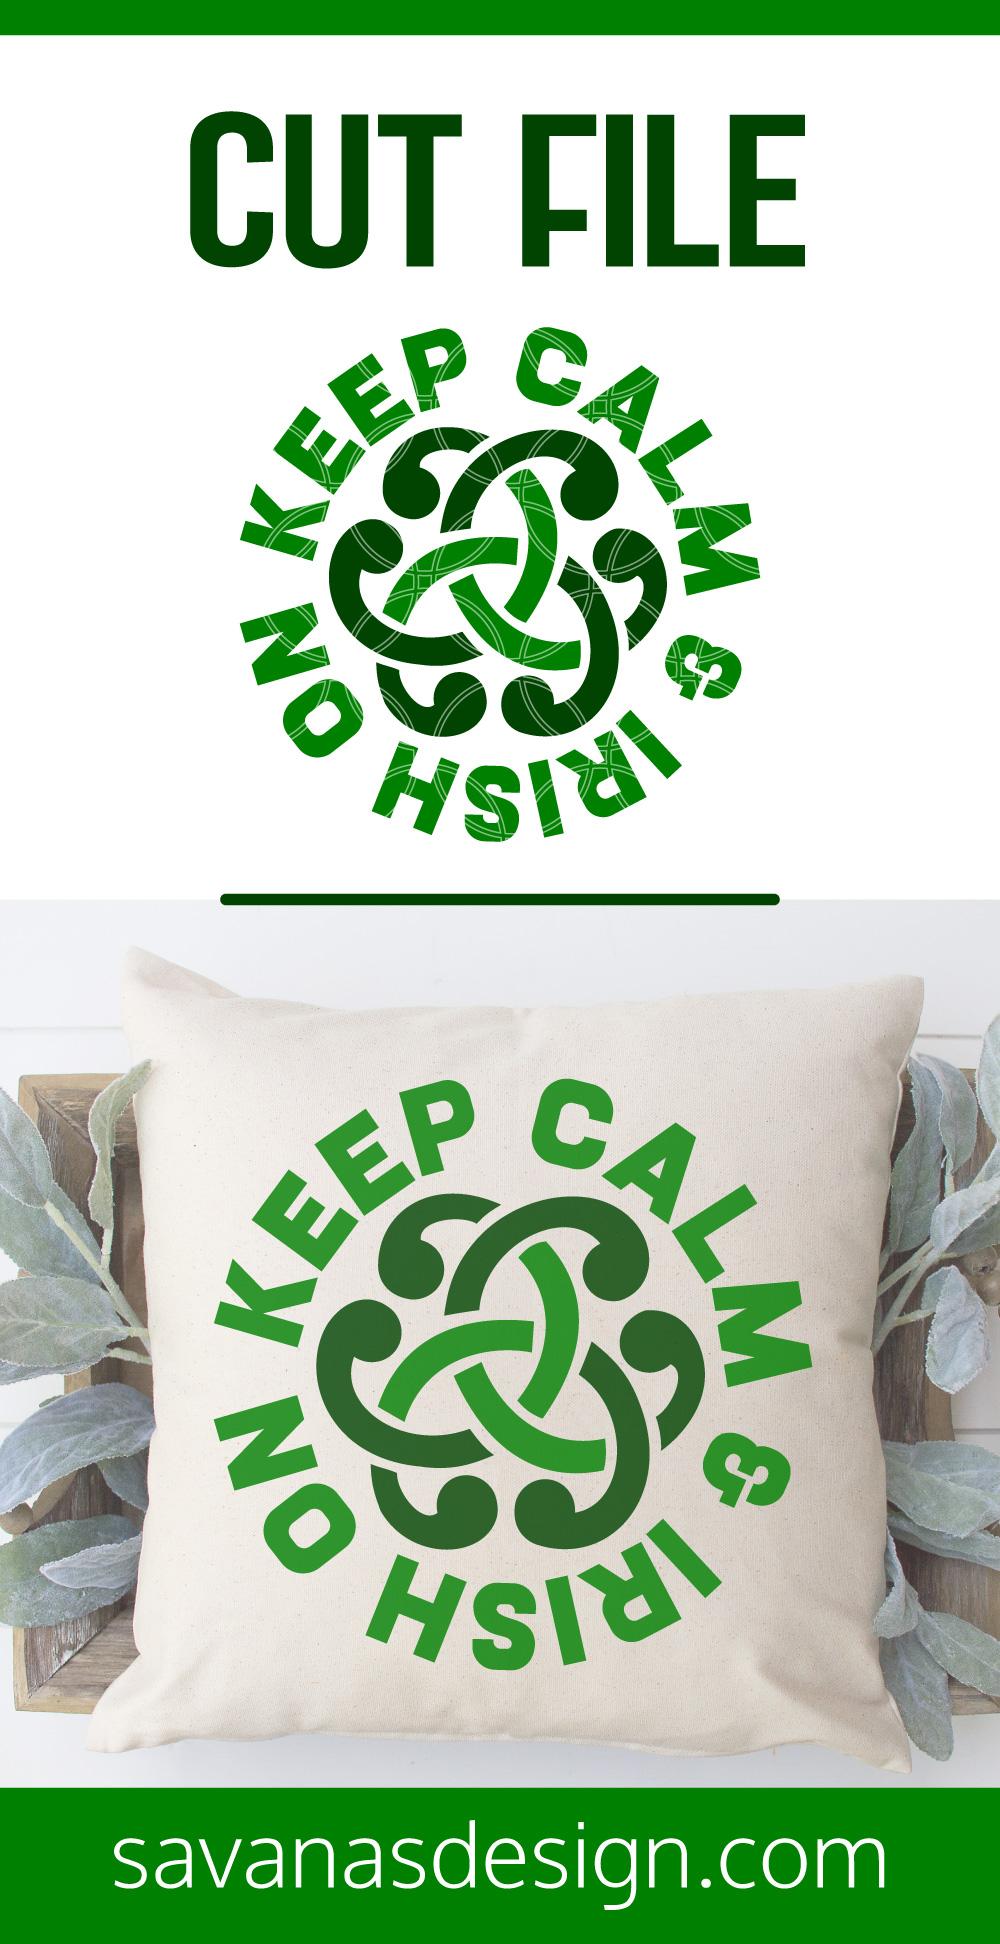 Keep Calm and Irish On SVG Pinterest